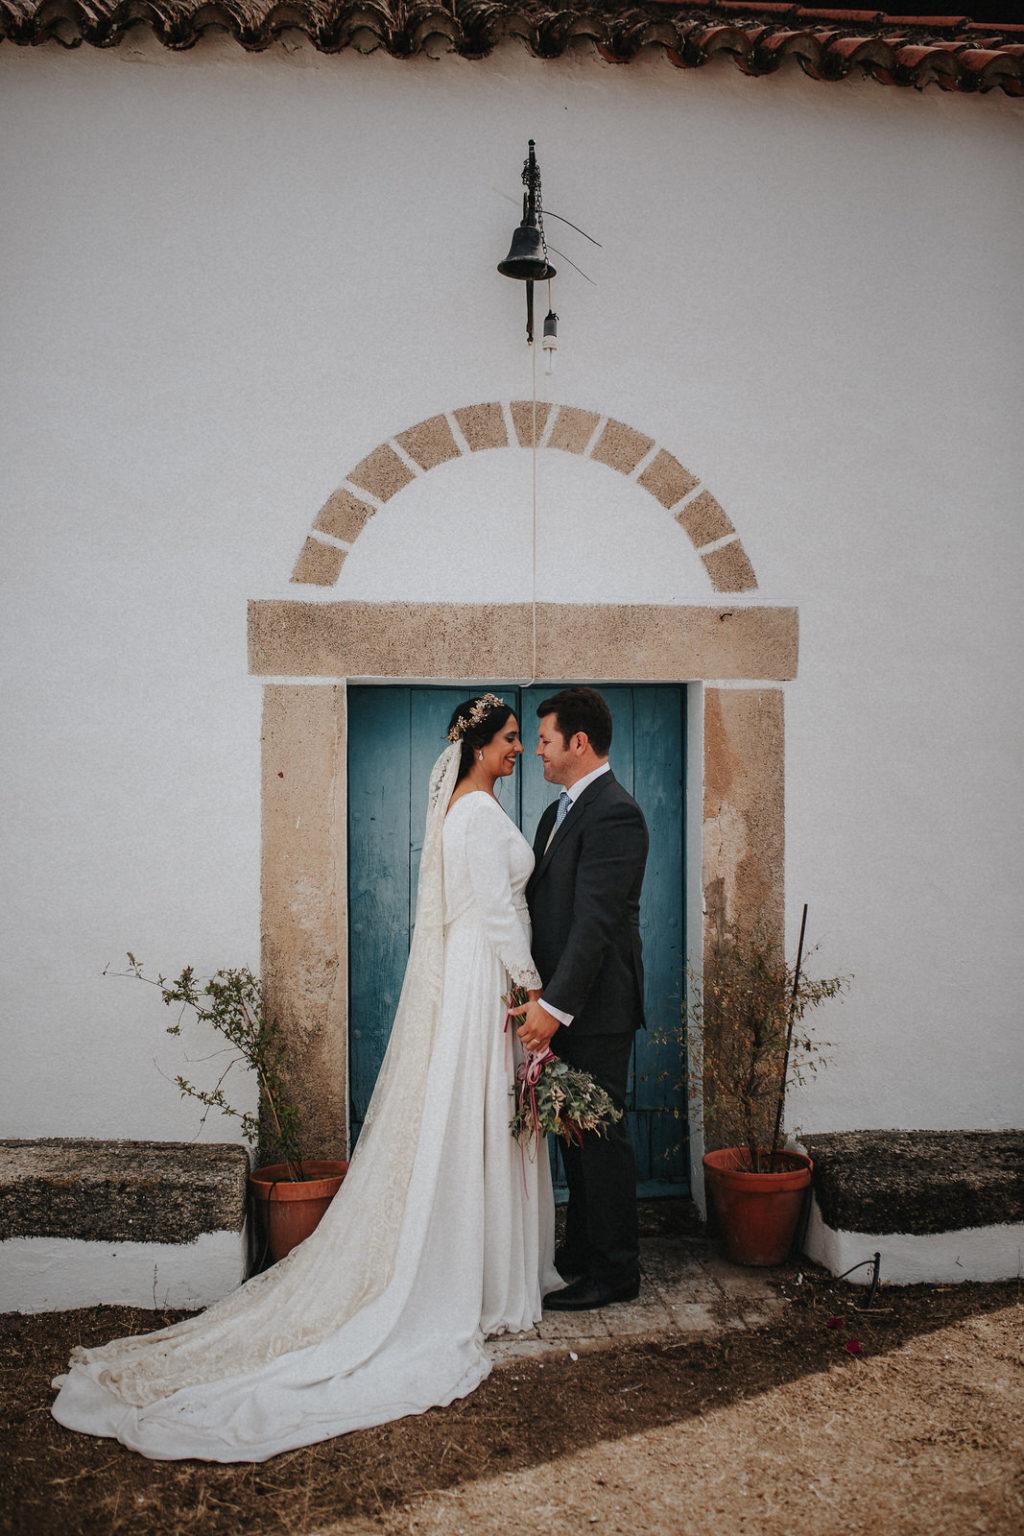 fotógrafo boda en el campo-Reportaje de boda intimo, diferente, natural. Boda Extremadura